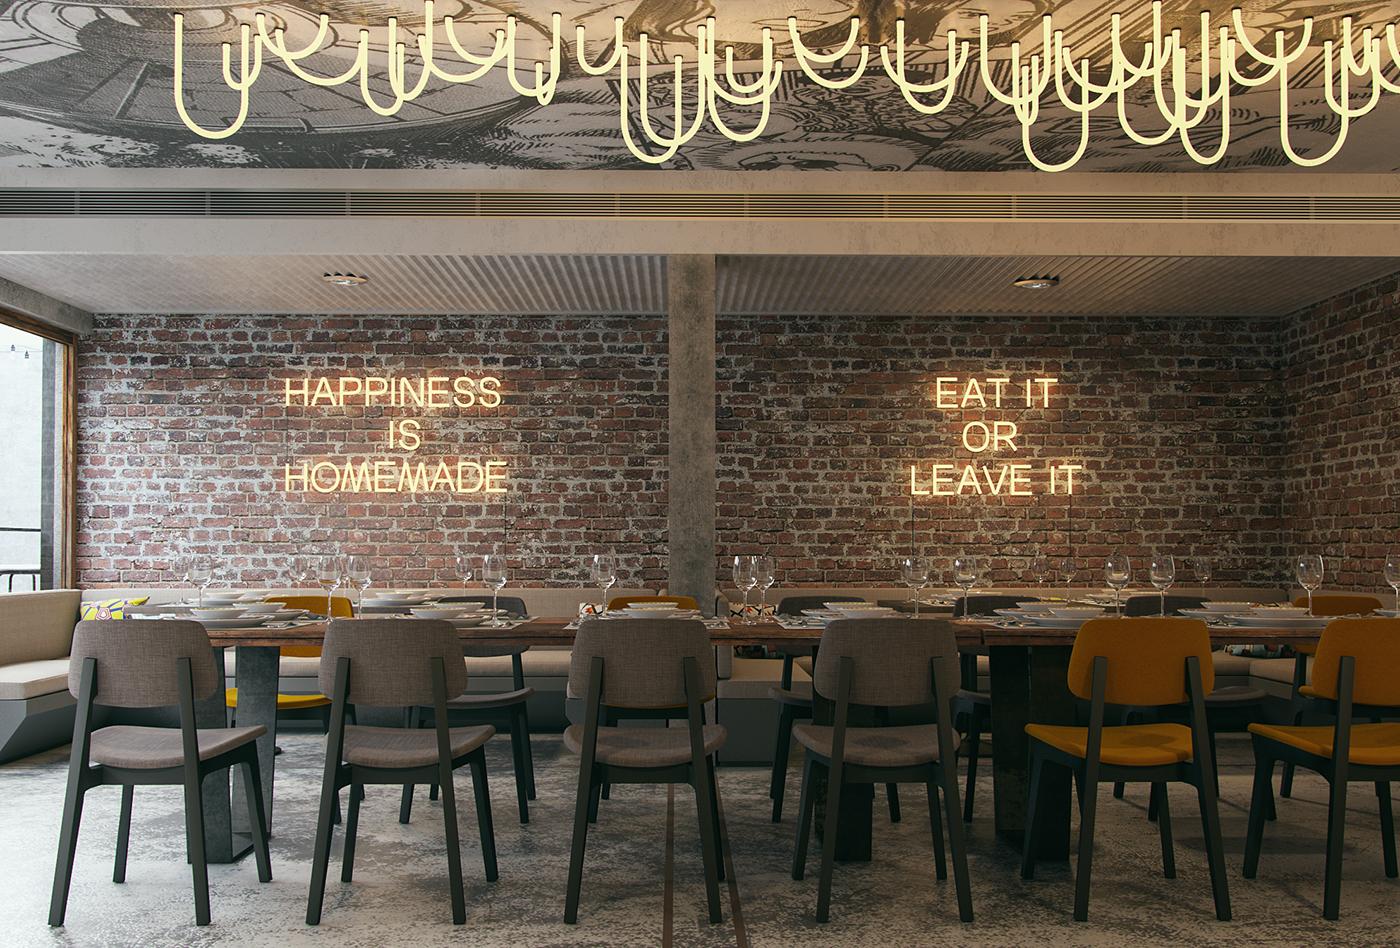 firefly restaurant interior design YENTGQI